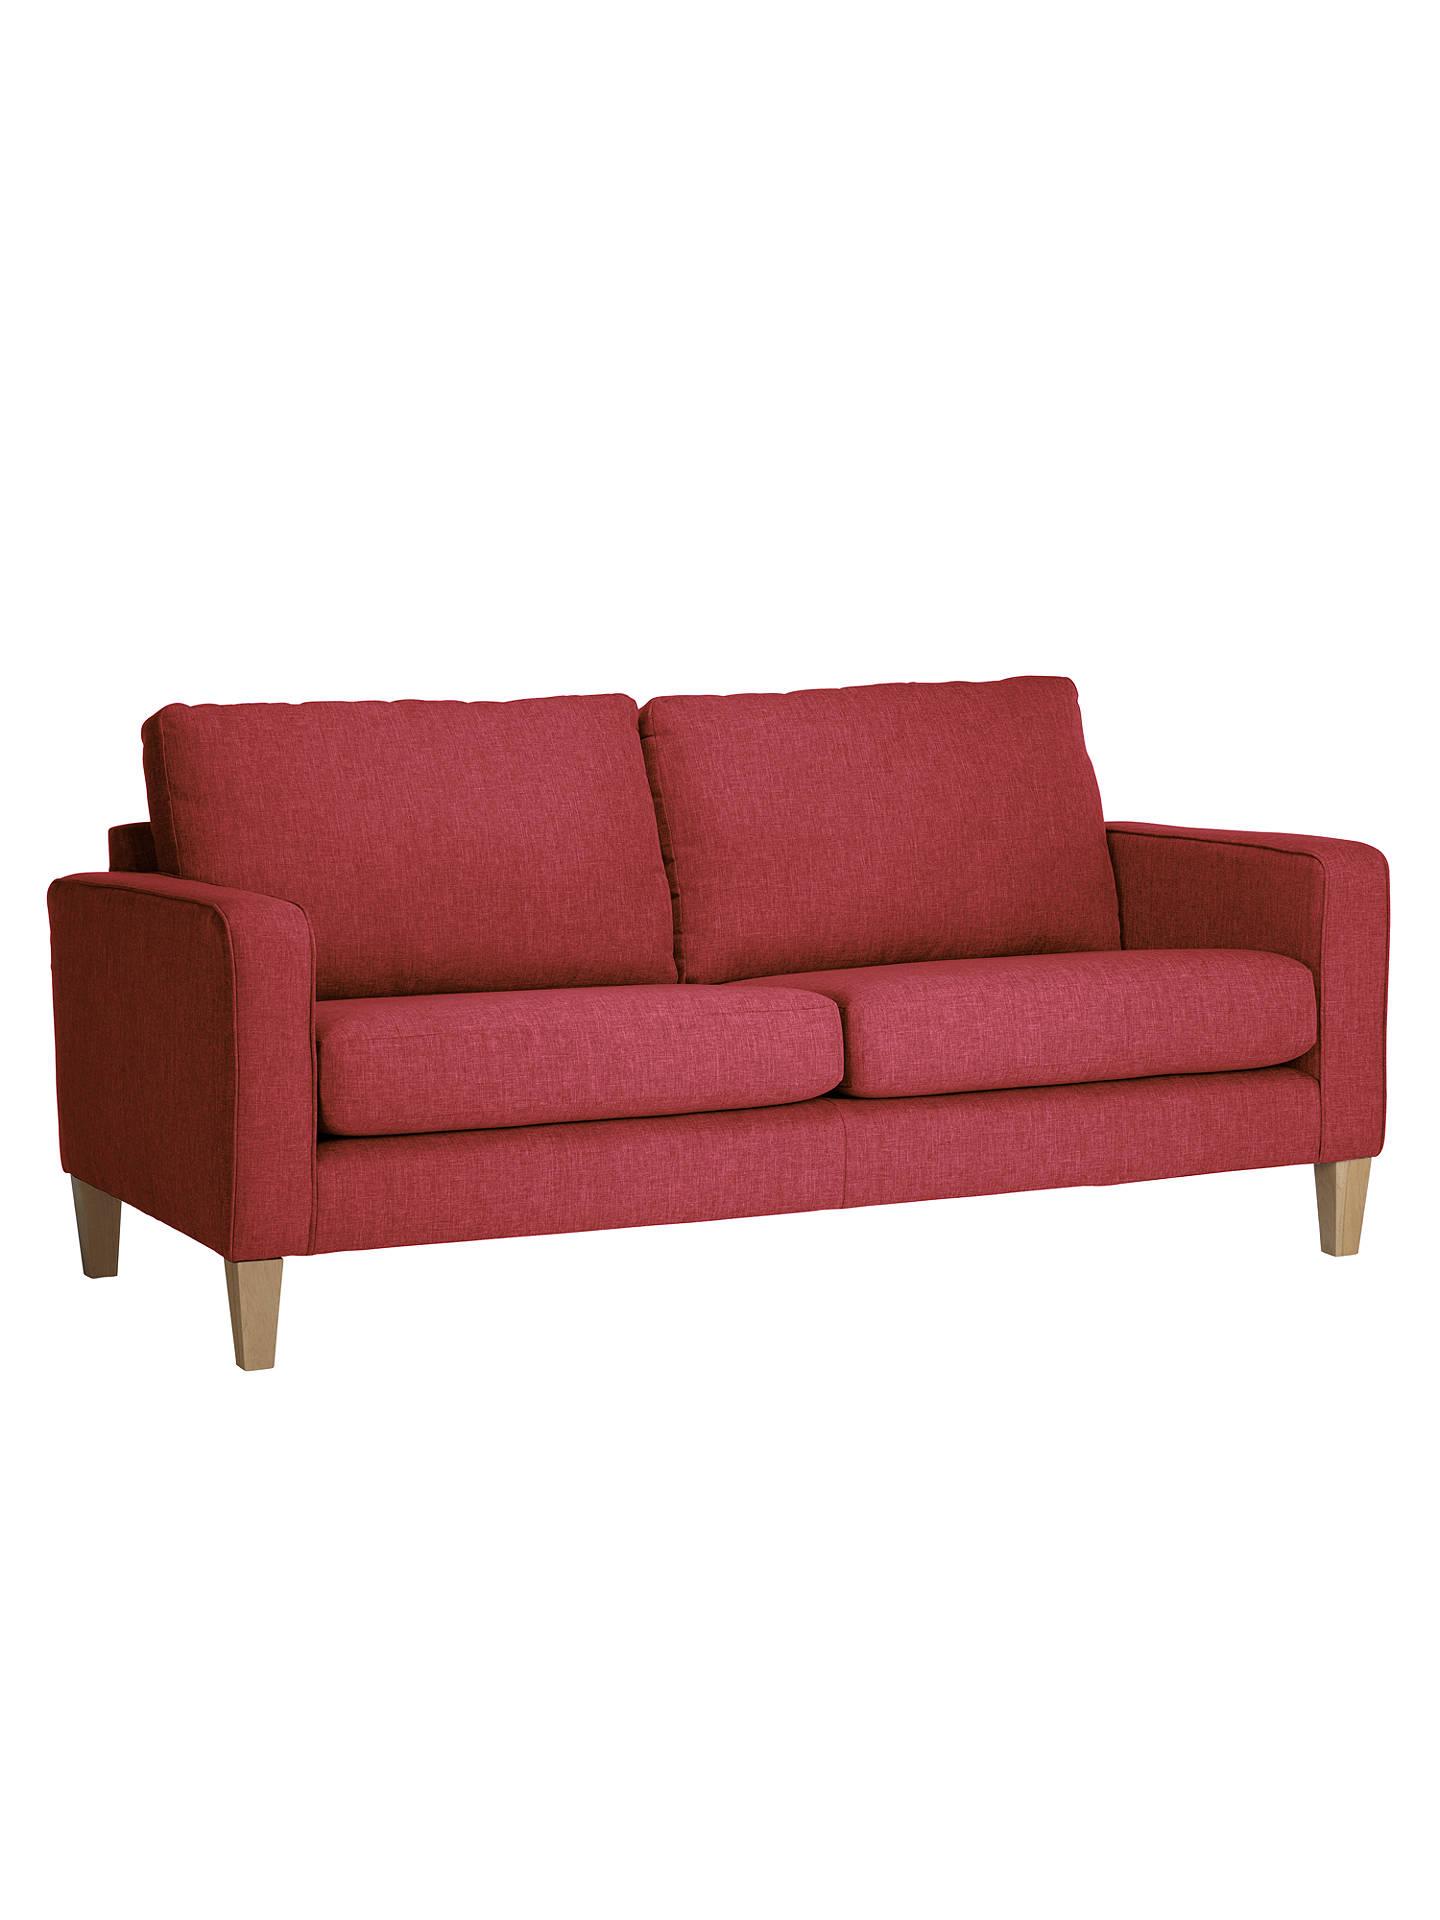 John Lewis The Basics Jackson Small 2 Seater Sofa at John ...